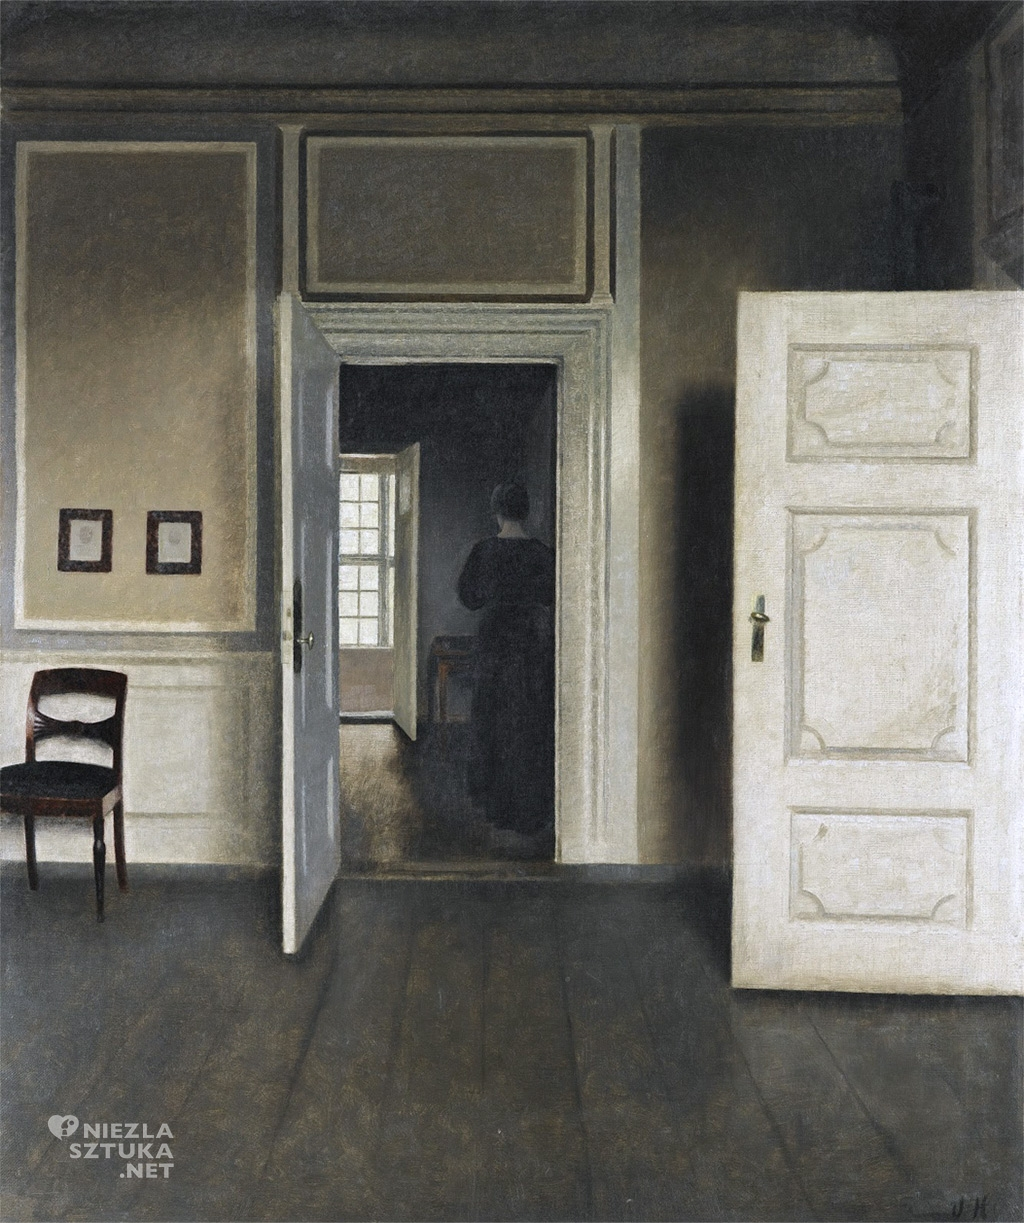 Vilhelm Hammershøi, Wnętrze na Strandgade 30, 1901